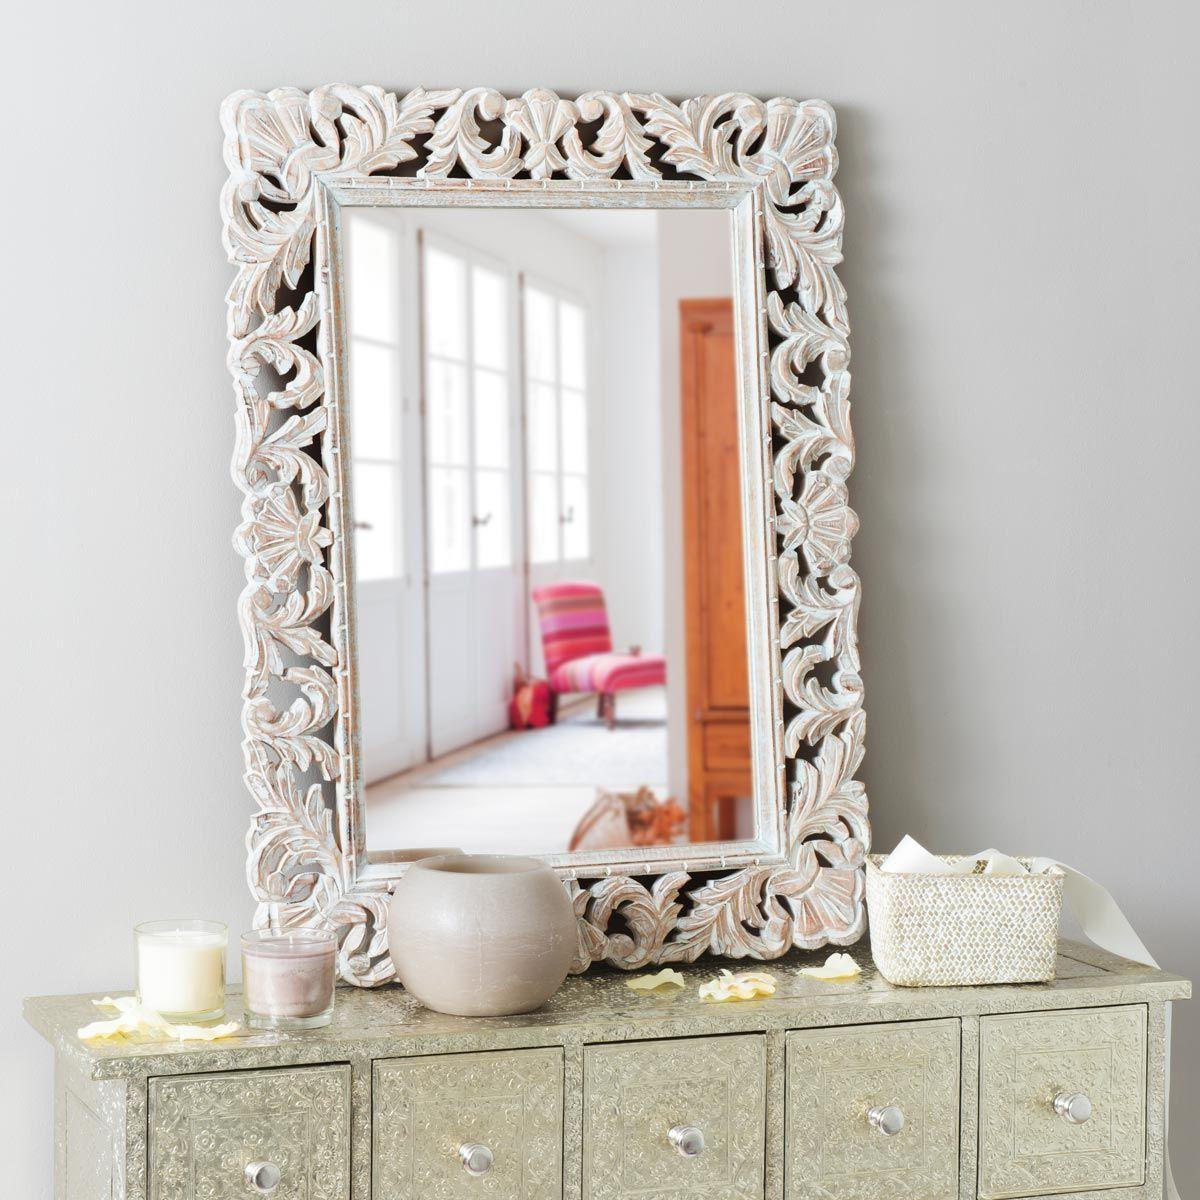 Bleached Mango Wood Mirror 60x80 Kyara Maisons Du Monde